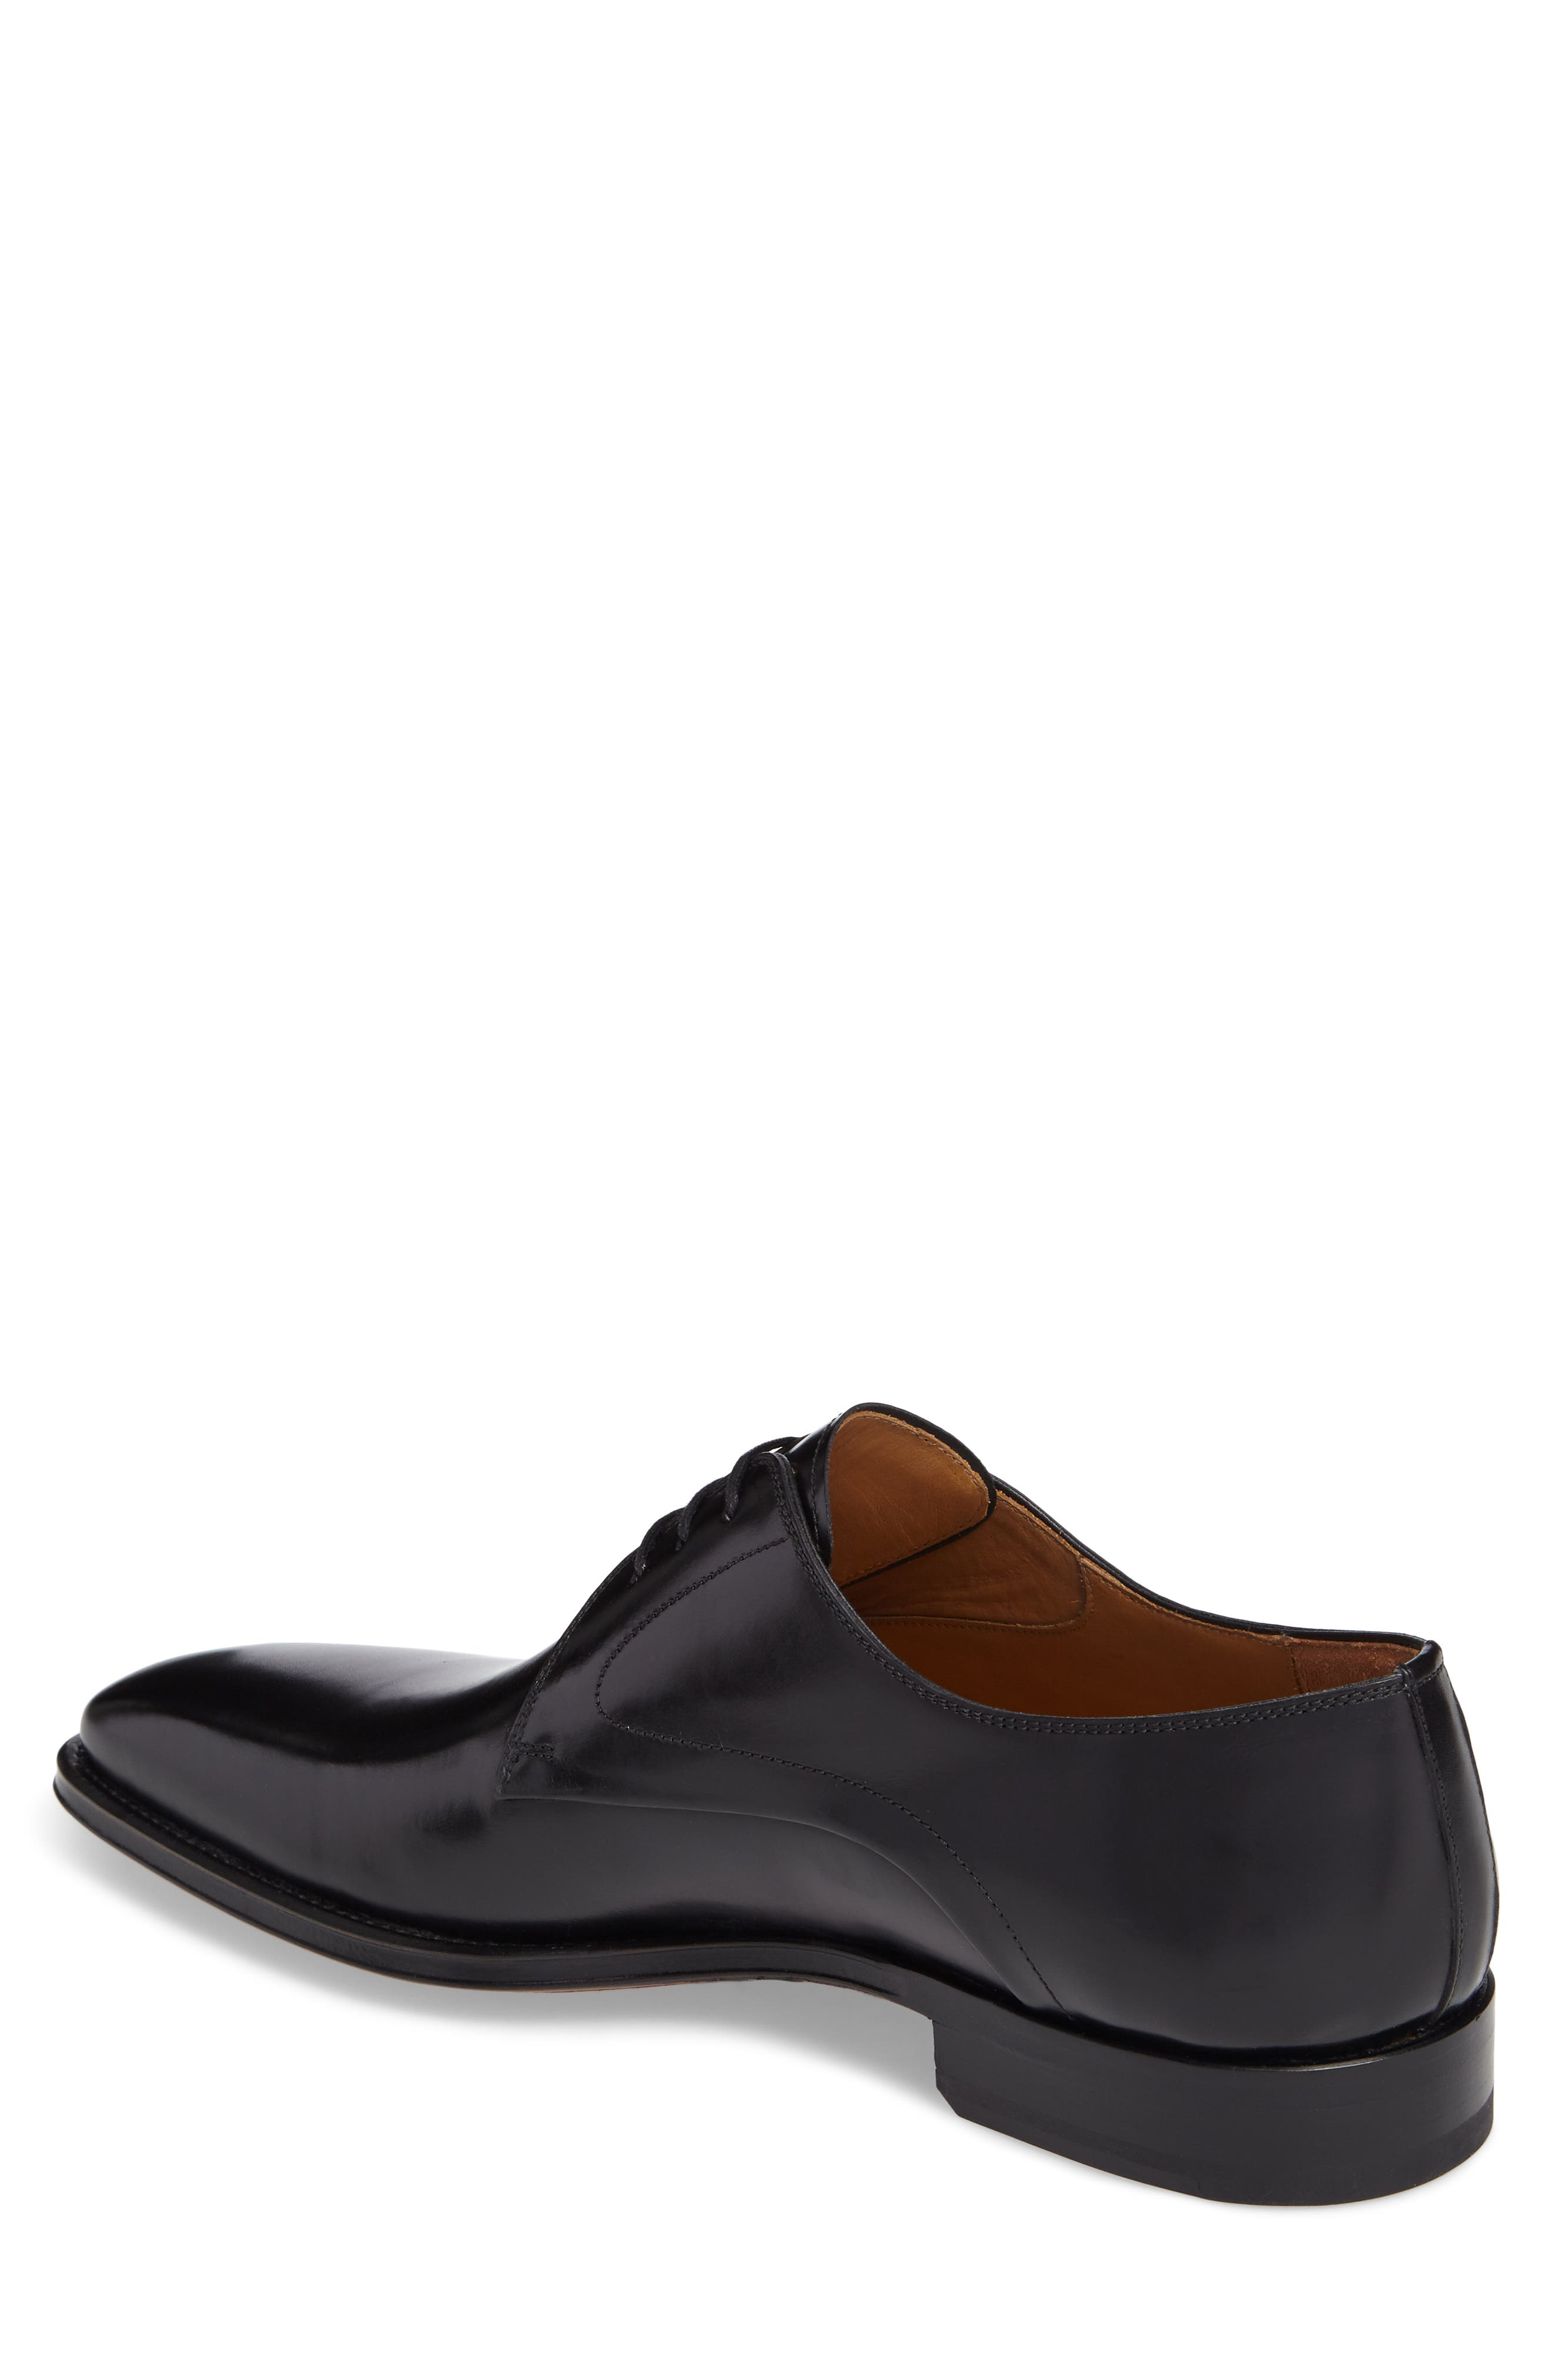 Mario Plain Toe Derby,                             Alternate thumbnail 2, color,                             Black Leather